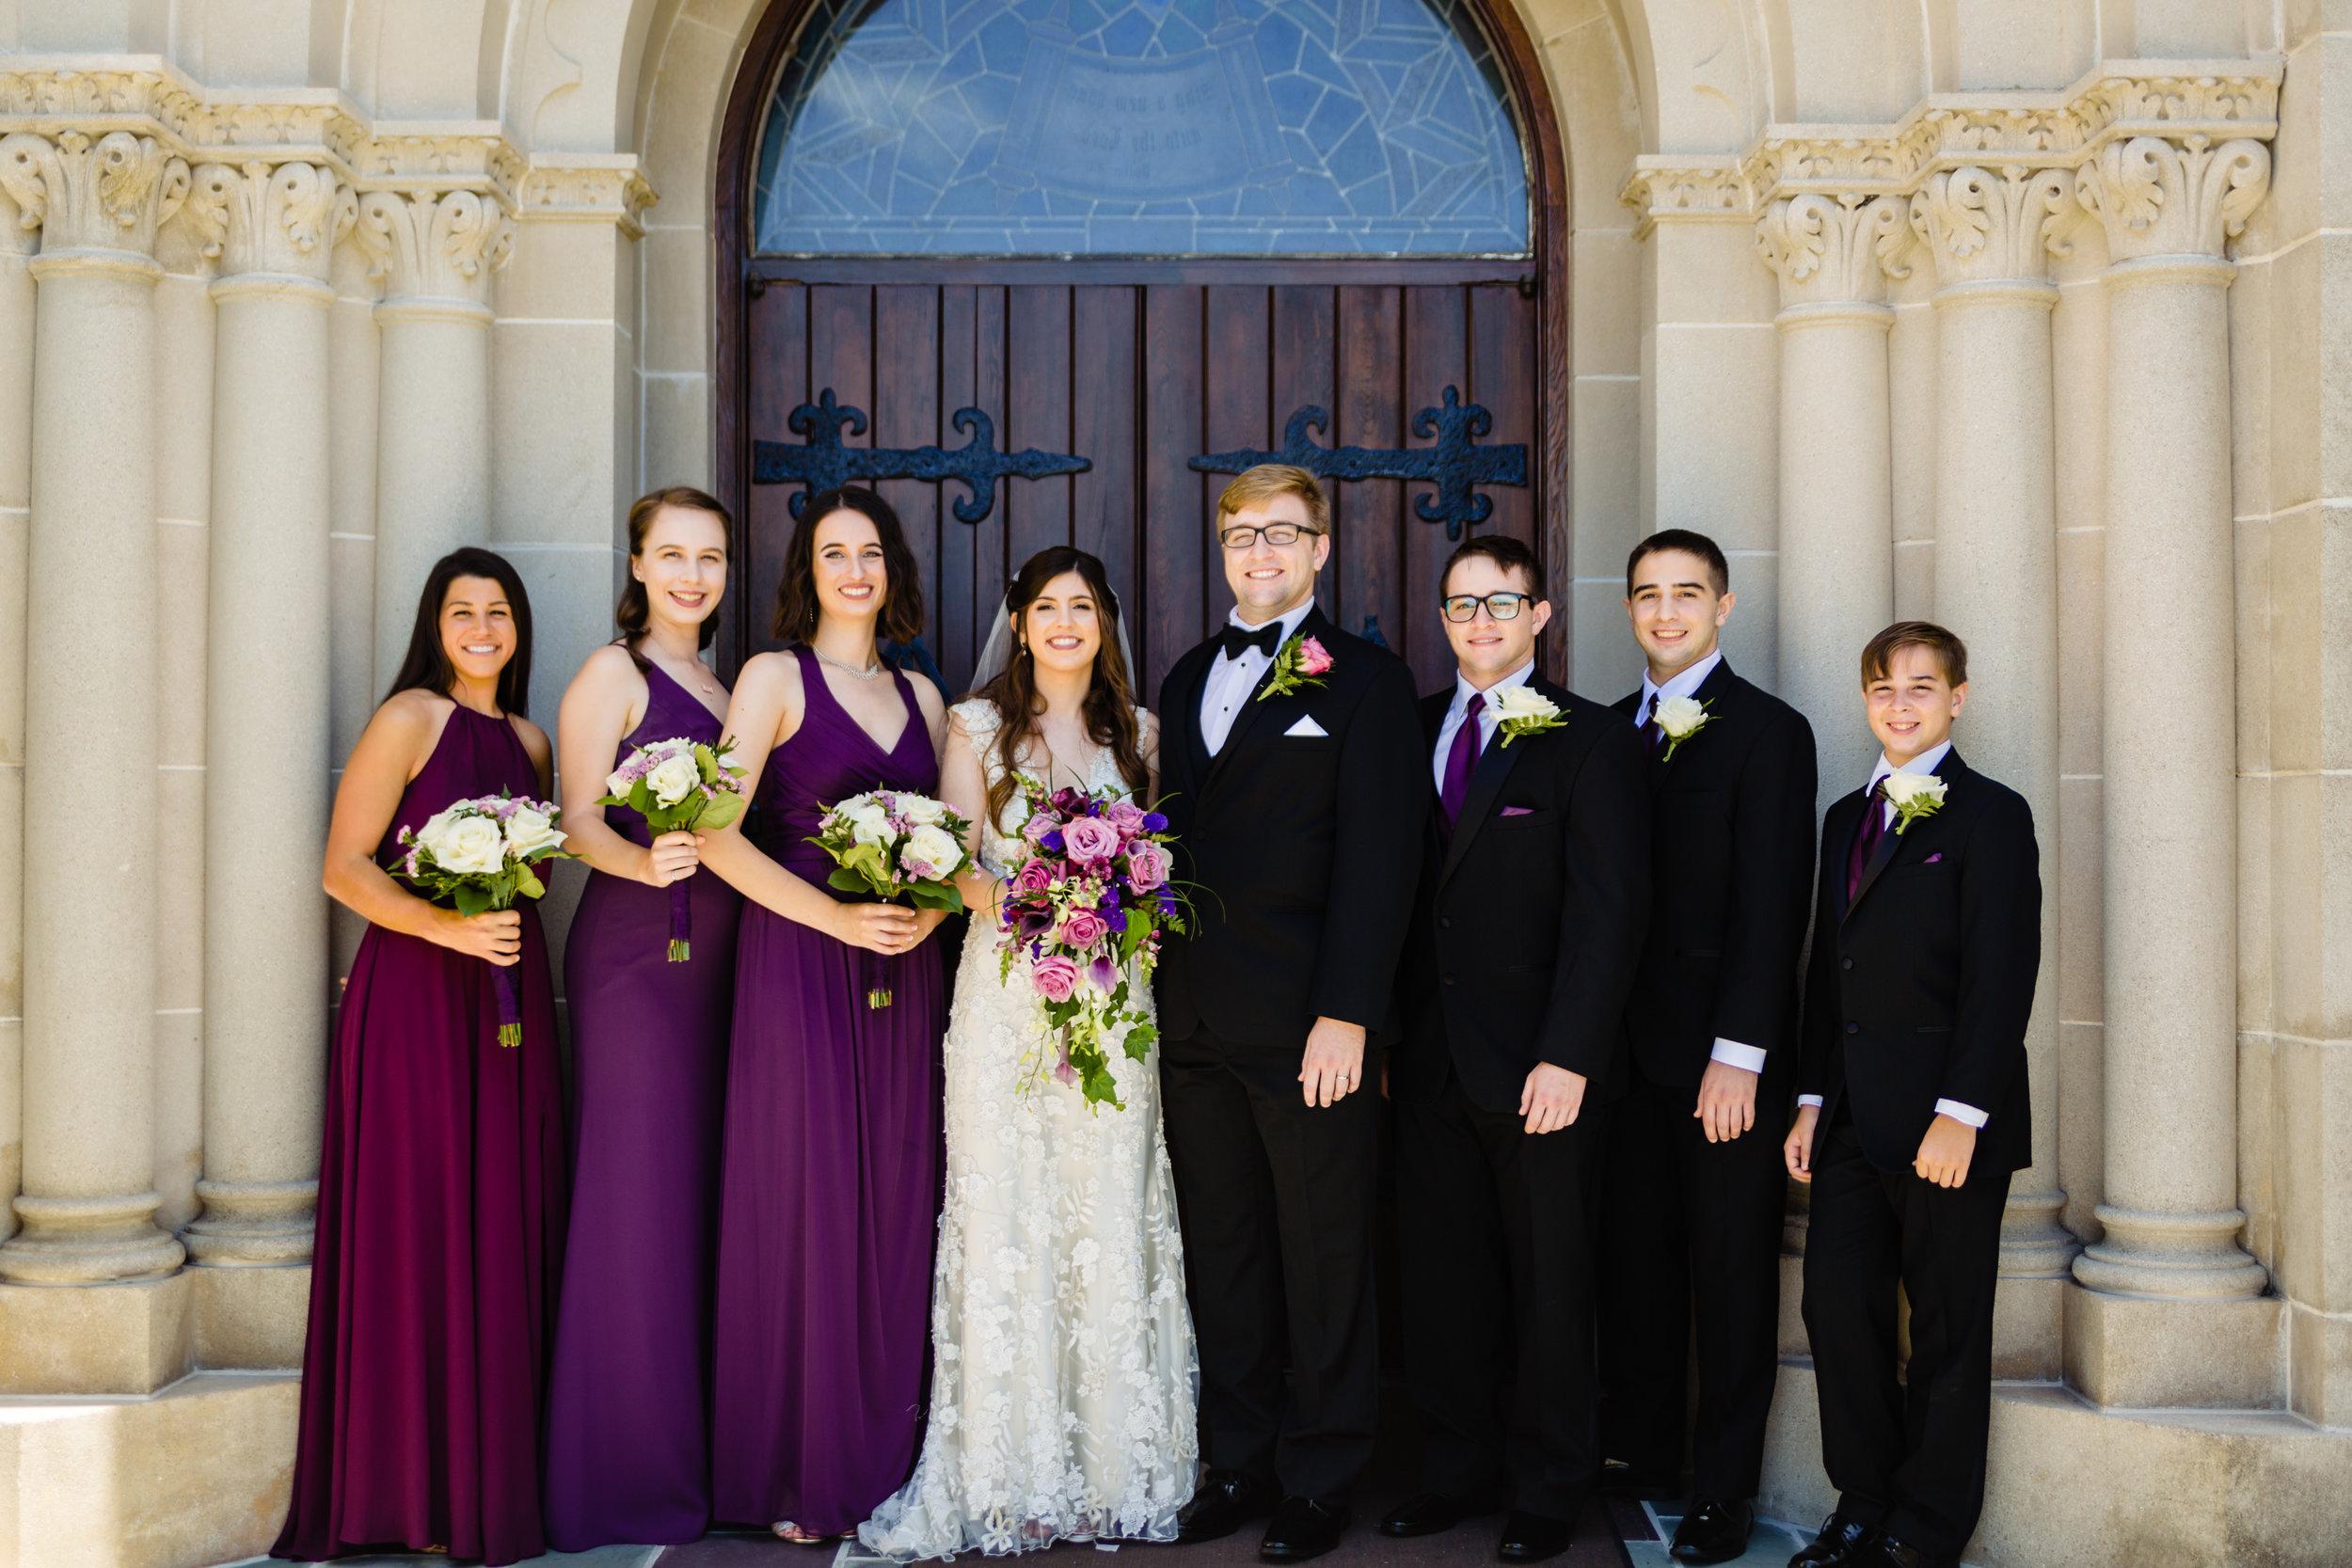 HAH_Zoe and Daniel_Clearwater Wedding_309_2018.jpg